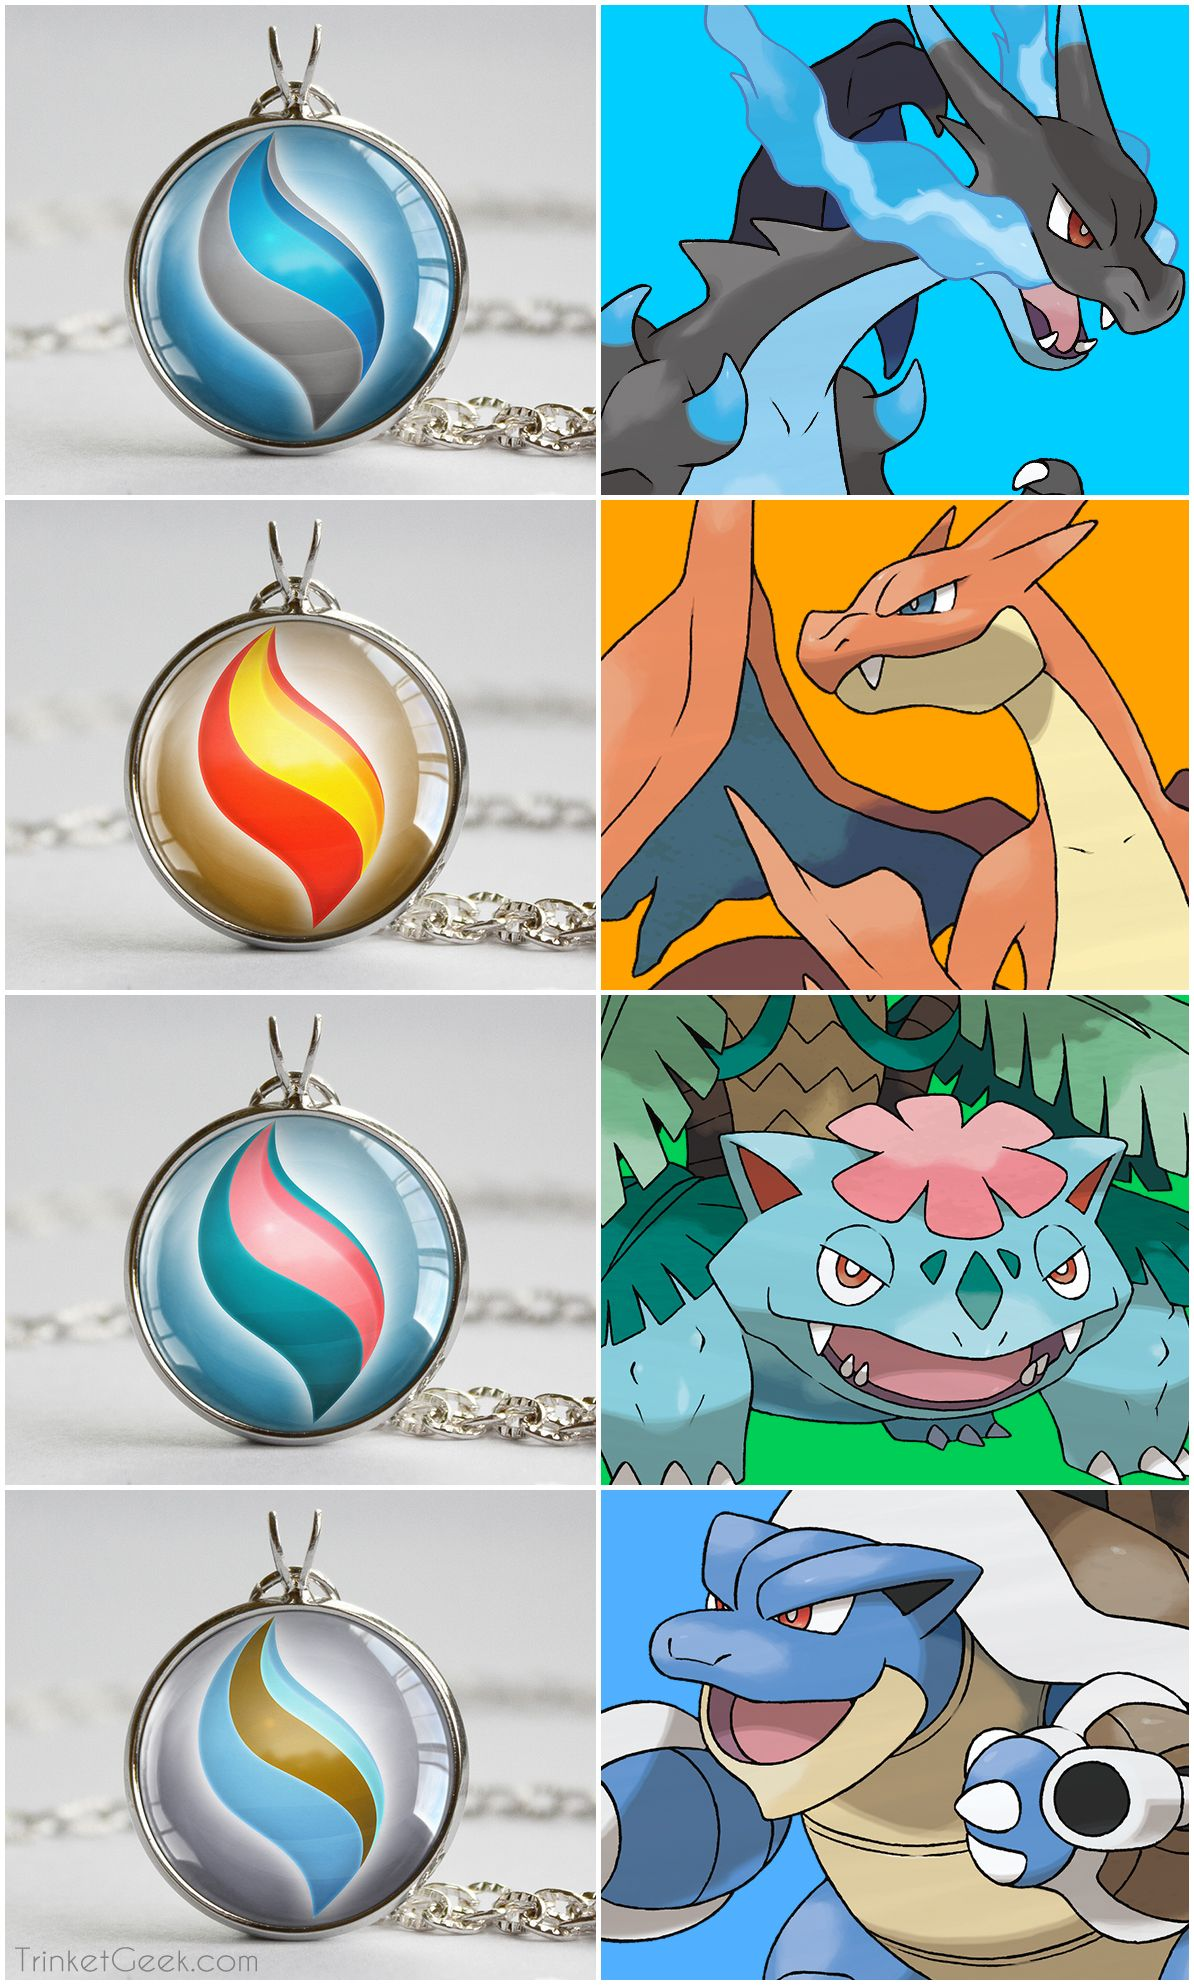 Pokemon X and Y Mega stone necklace pendants. Charizard, Venusaur and Blastoise. #nintendo #gaming #treatsforgeeks